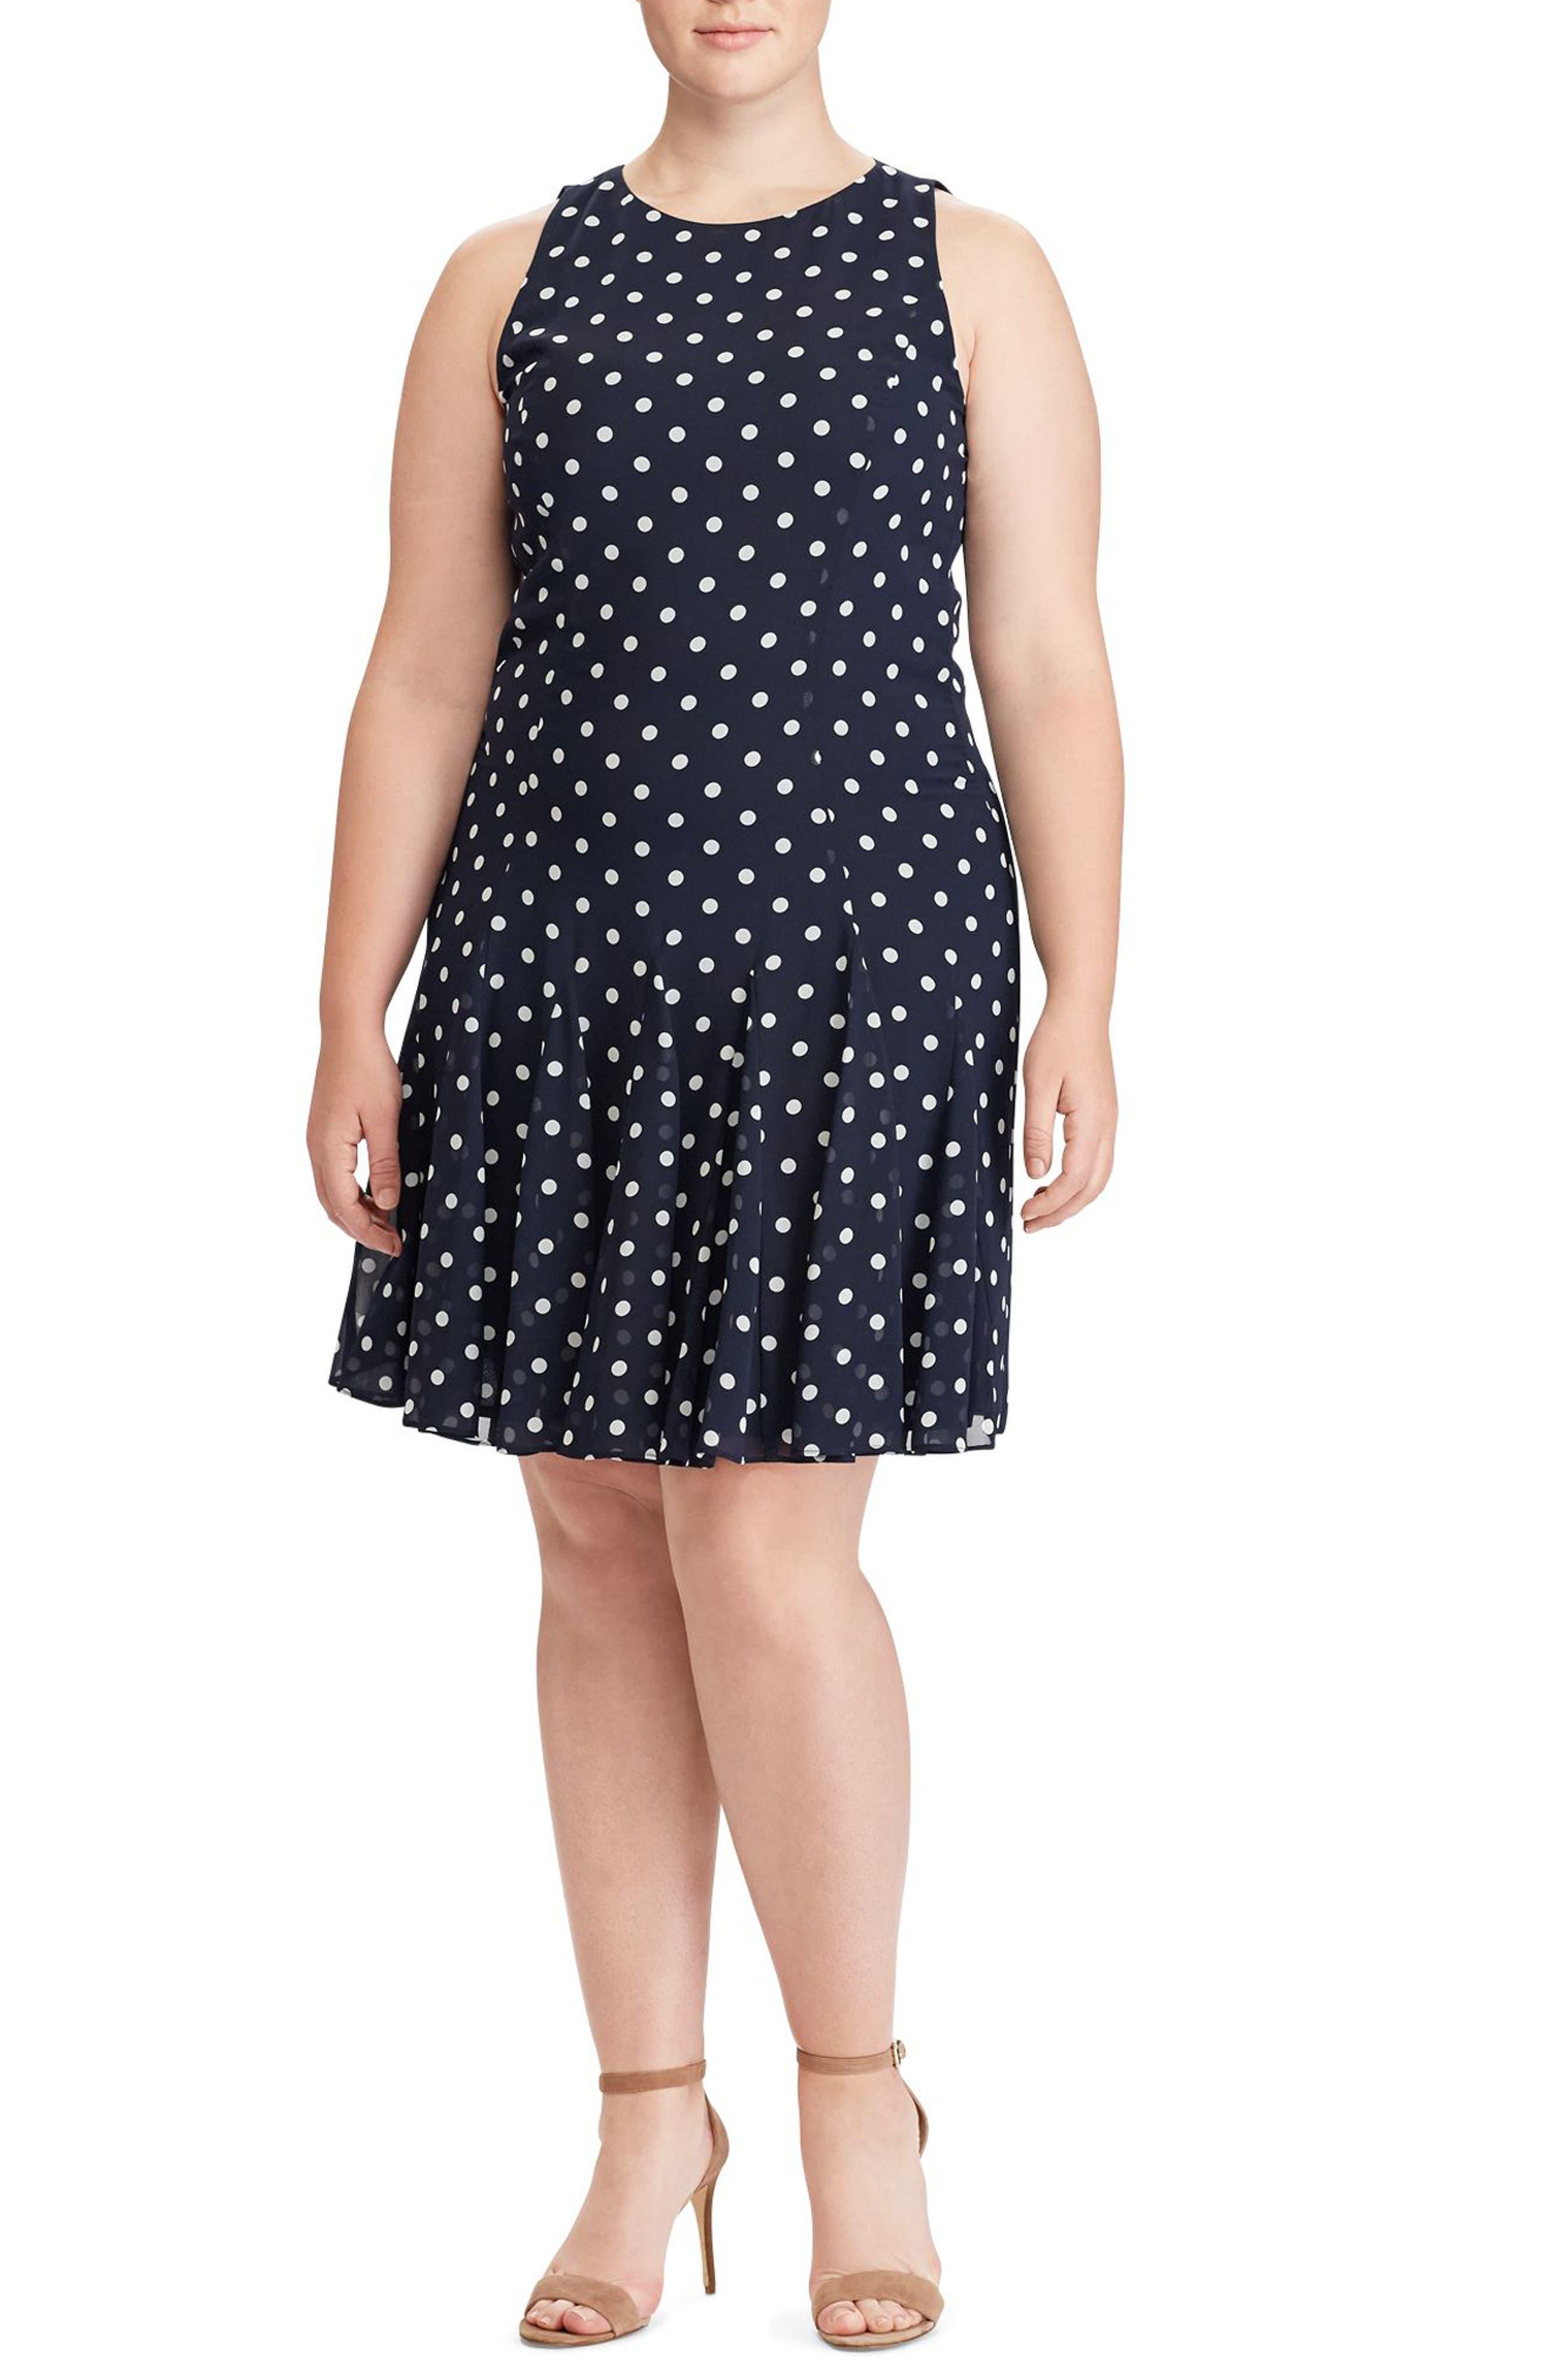 Main Image - Lauren Ralph Lauren Polka Dot Georgette Dress (Plus Size)